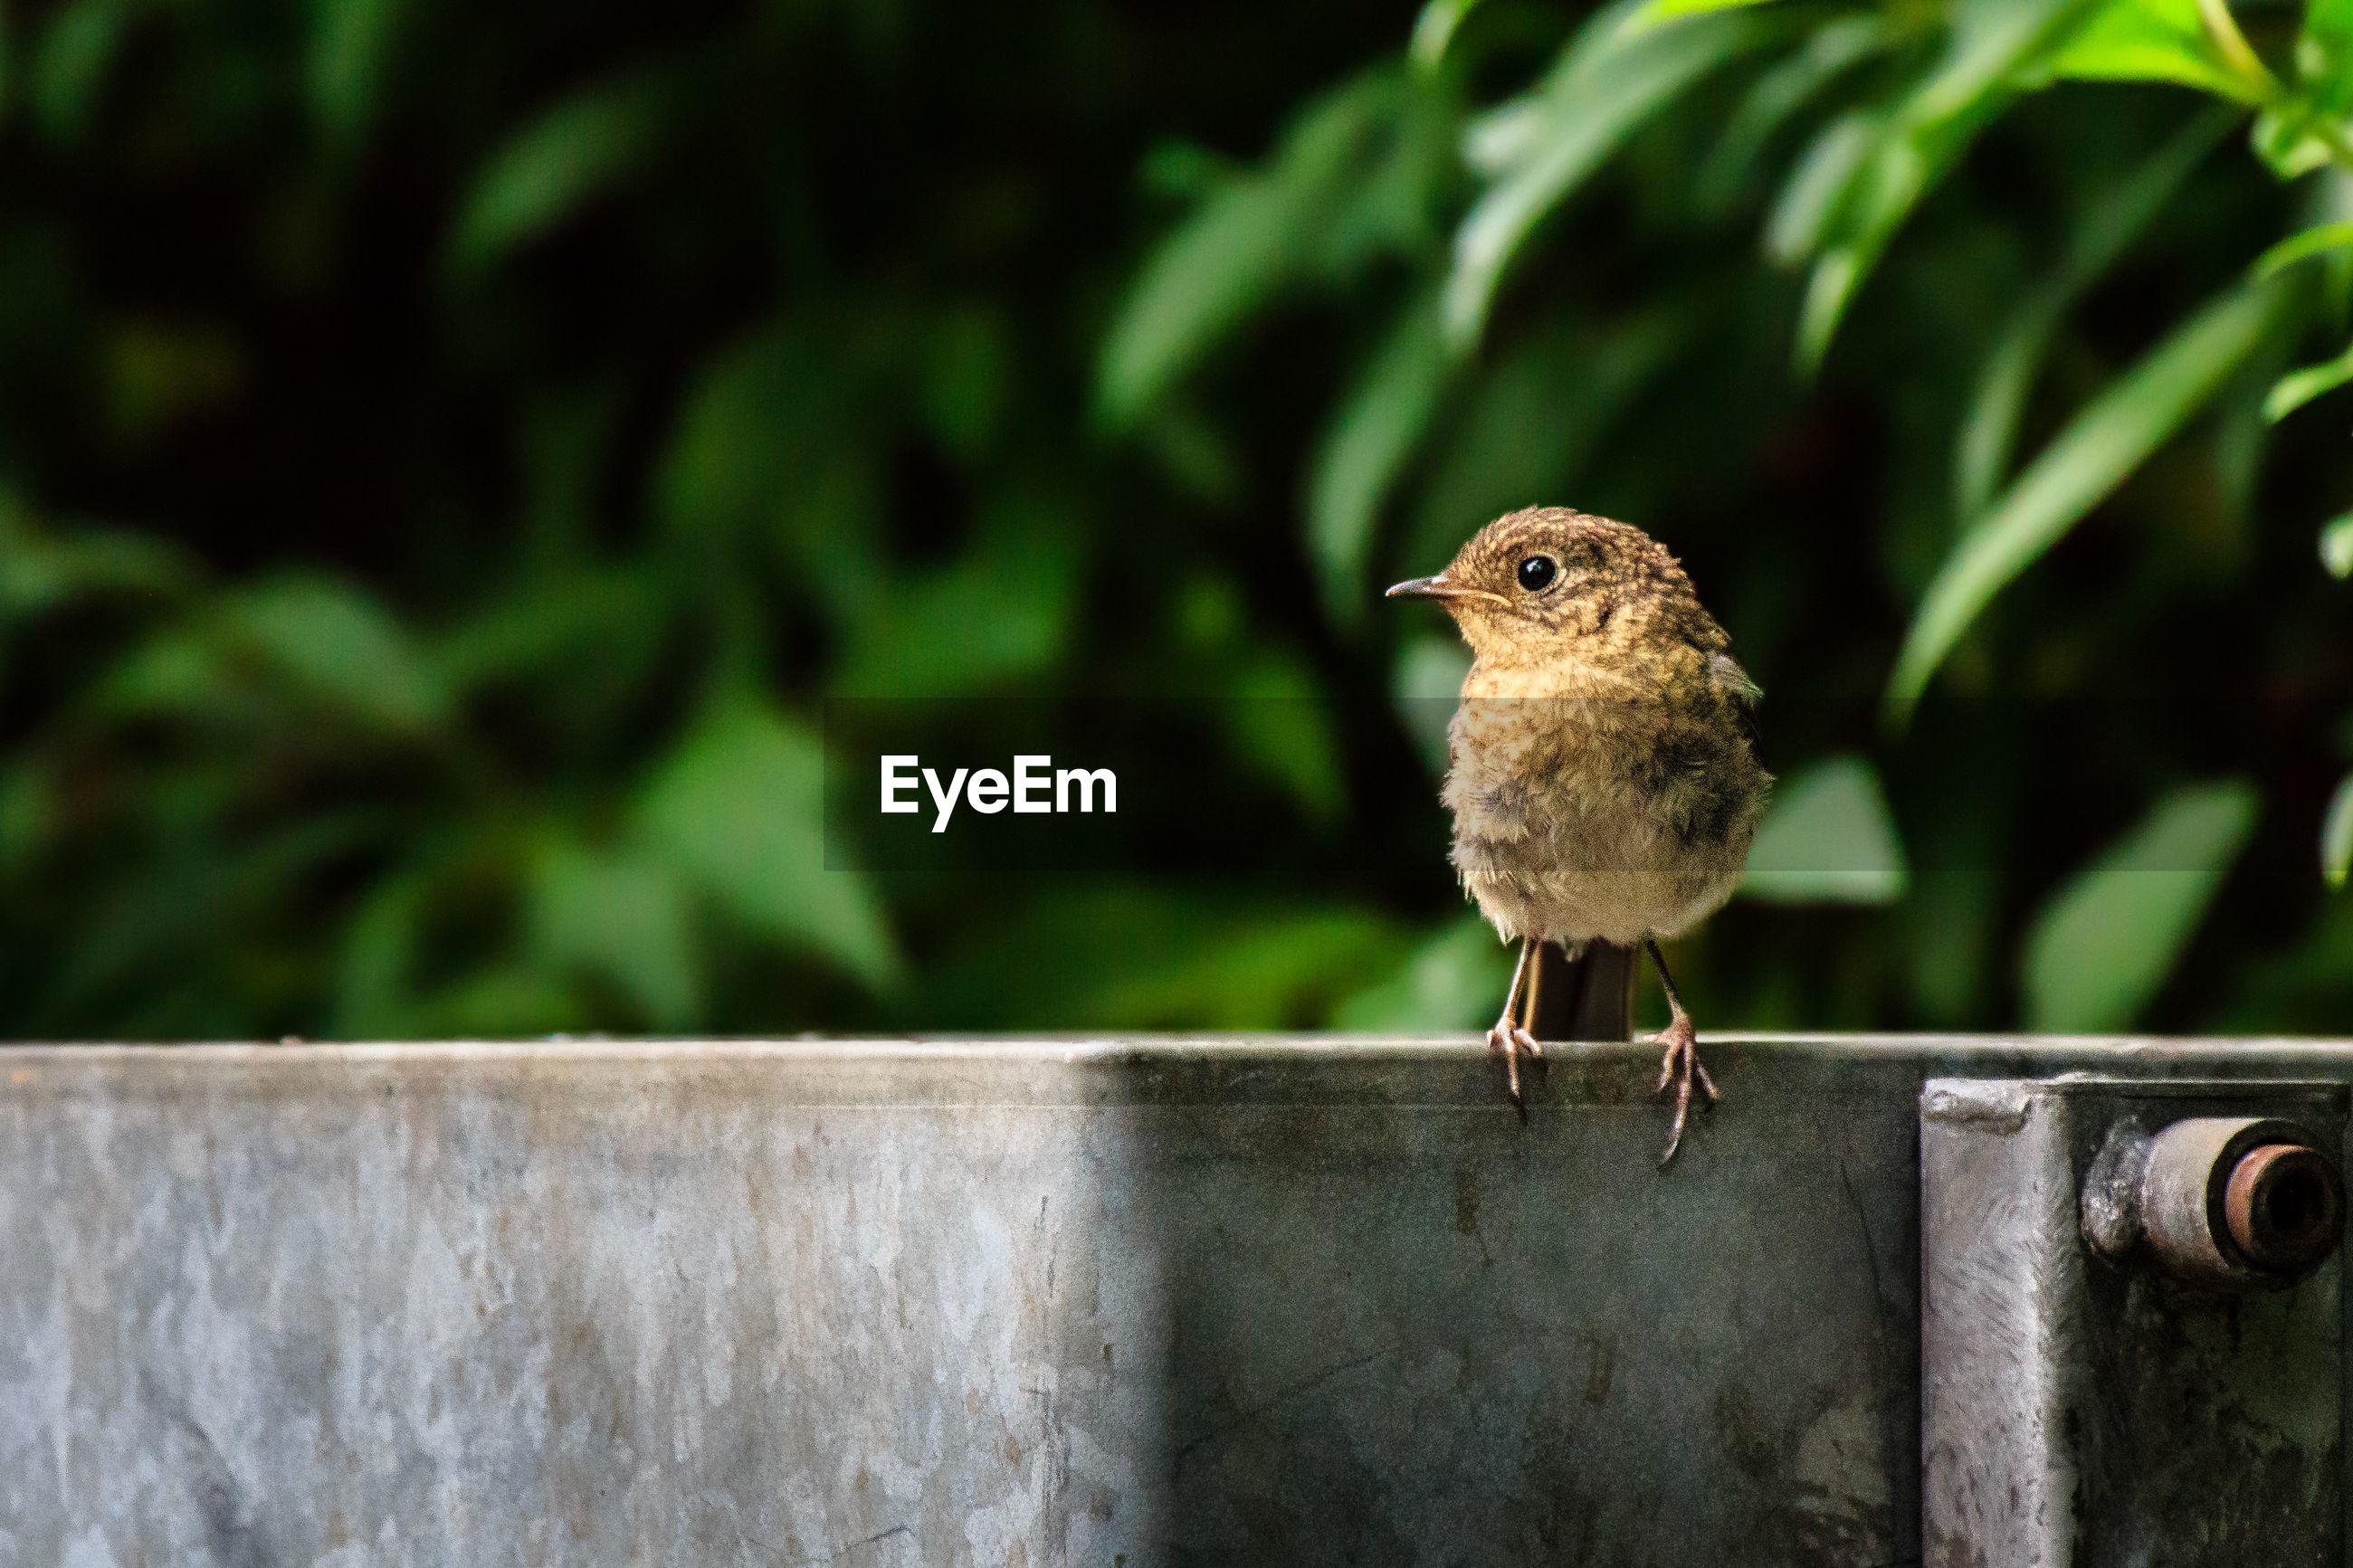 Wren bird sitting on trash bin